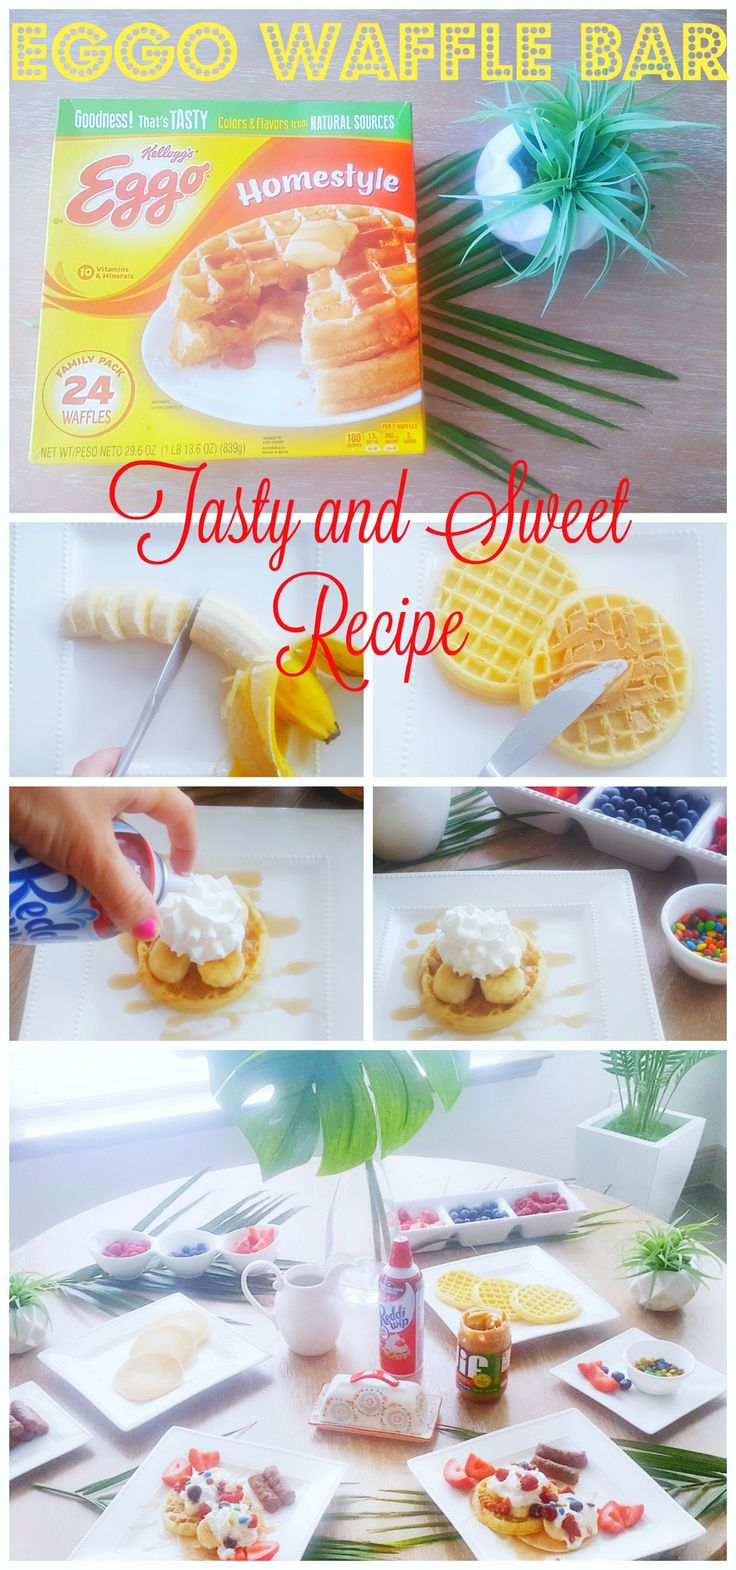 Tasty and Sweet Waffle Bar Anniversary Breakfast Eggo Waffle Bar Breakfast Ideas Brunch Ideas Party Food Ideas Waffle Toppings #EggoWaffleBar #ad